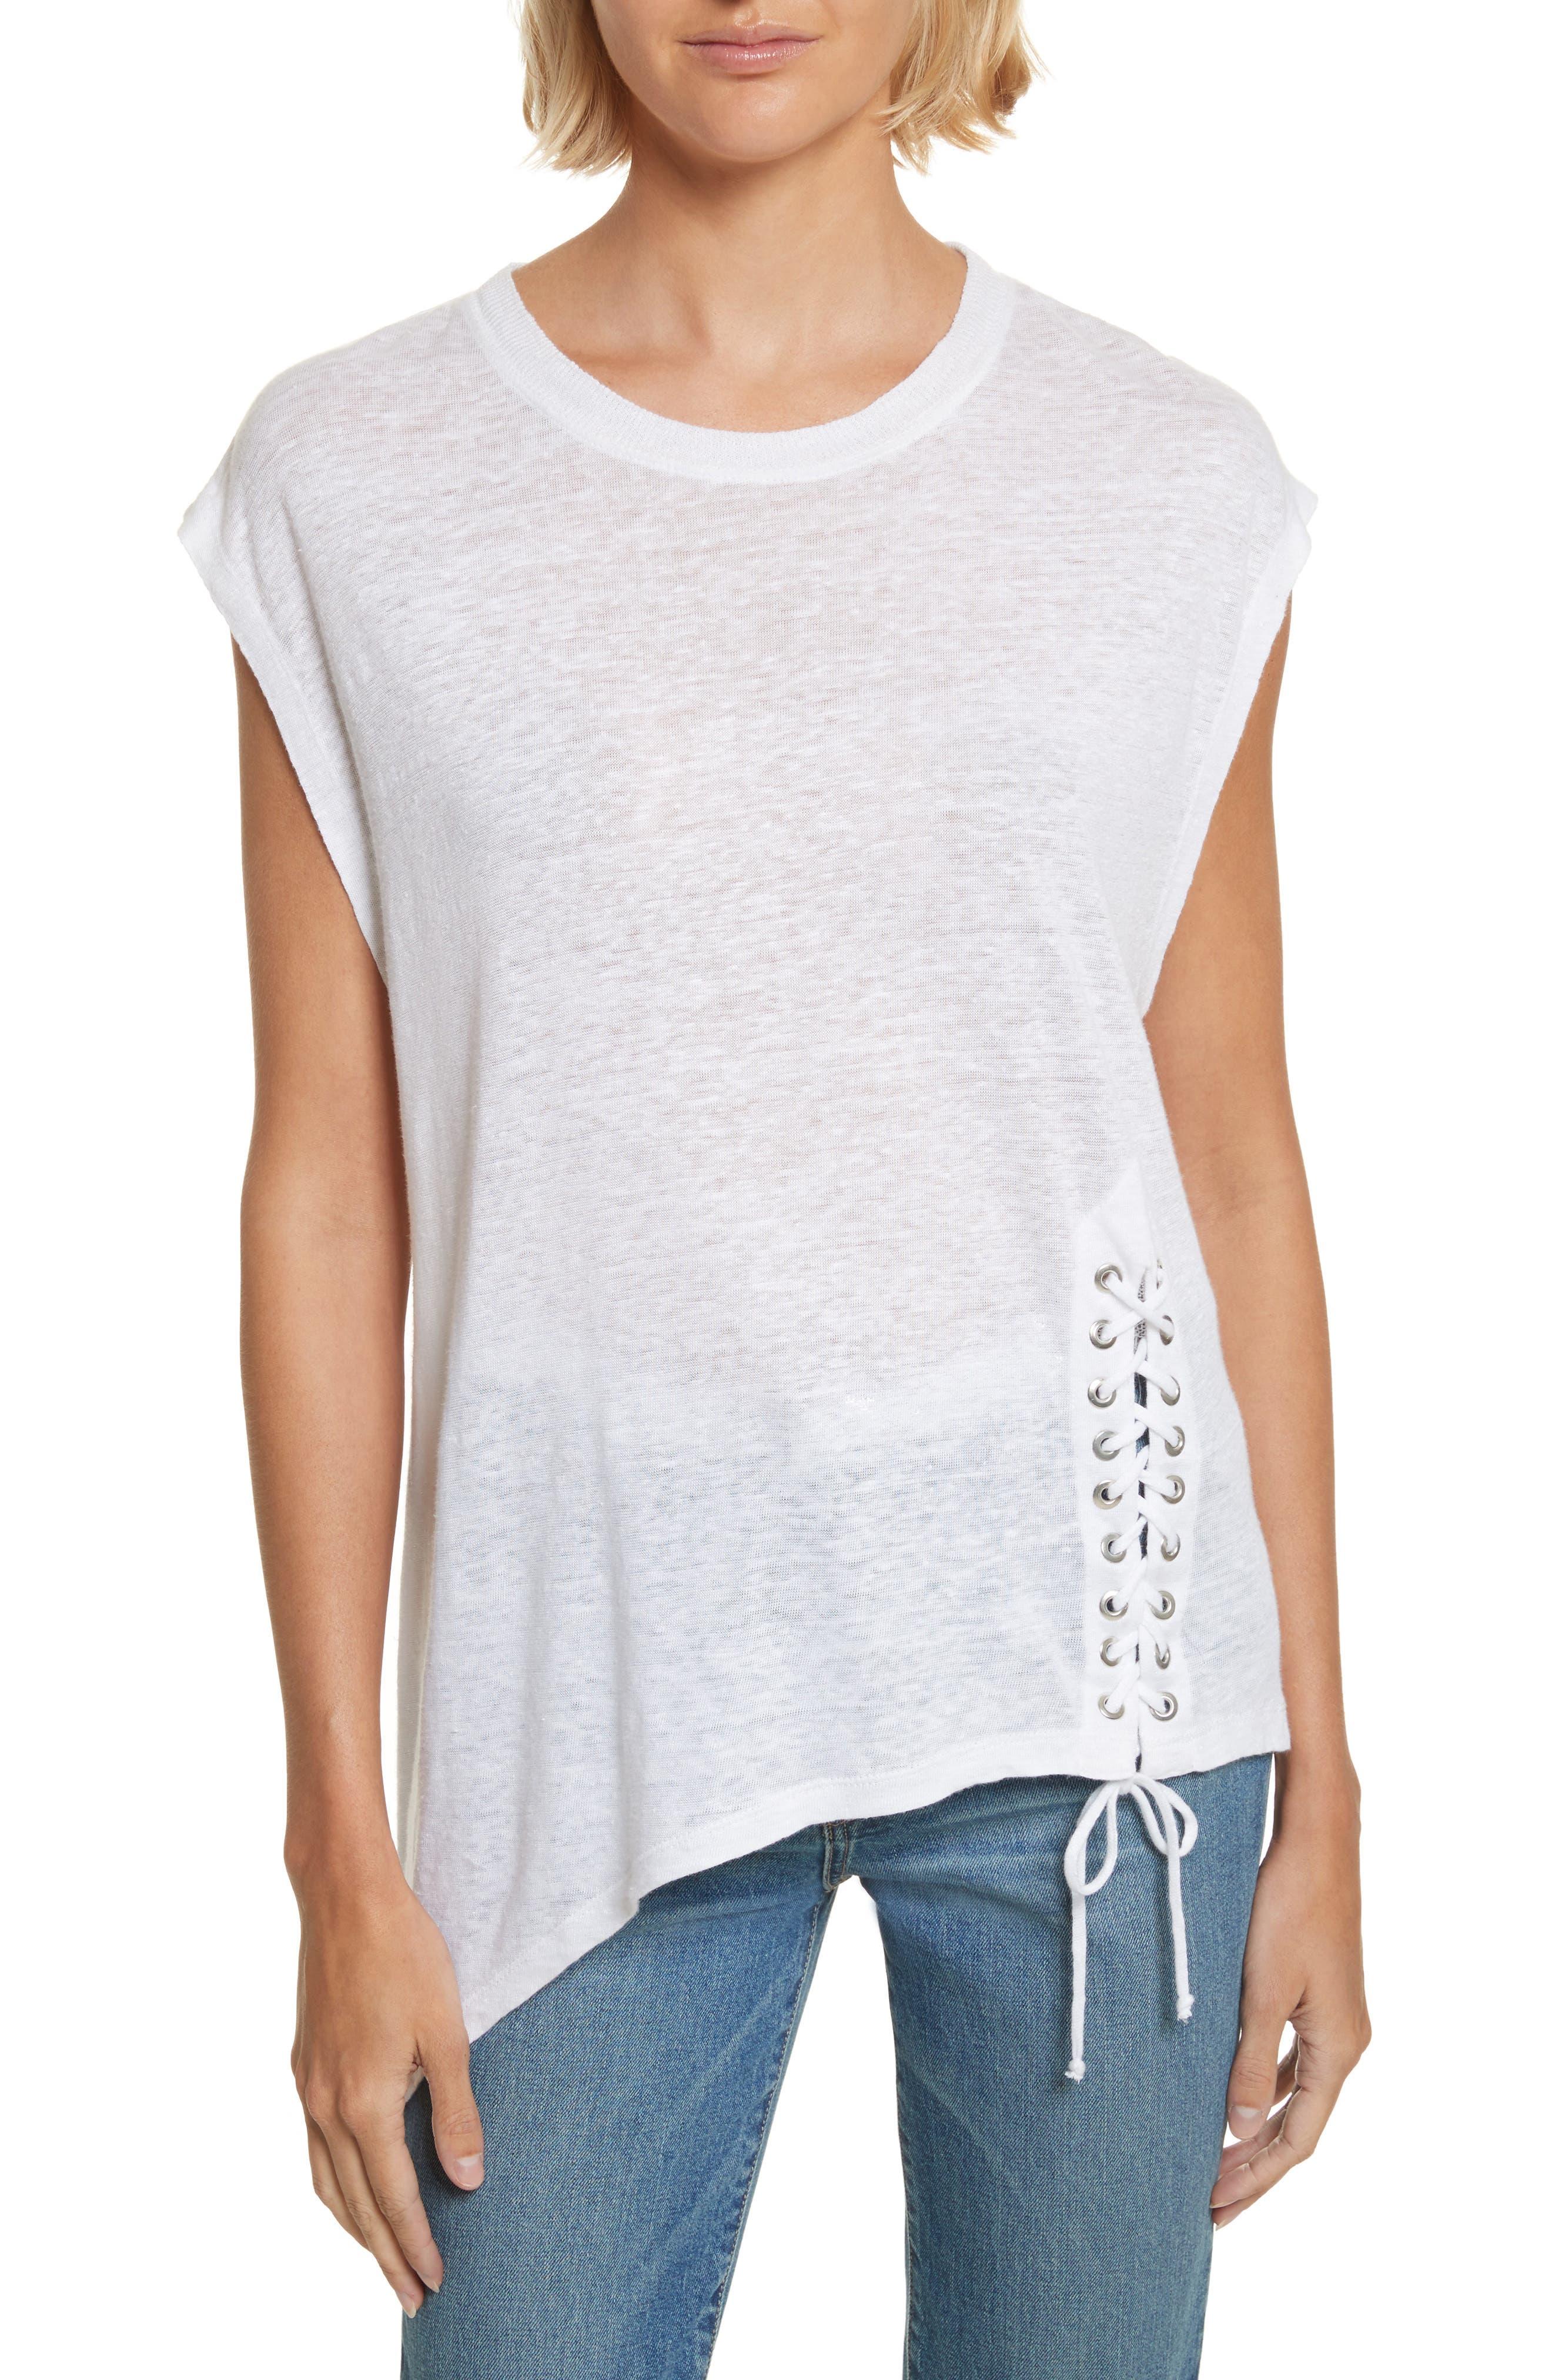 Karami Linen Asymmetrical Lace-Up Top,                             Main thumbnail 1, color,                             White